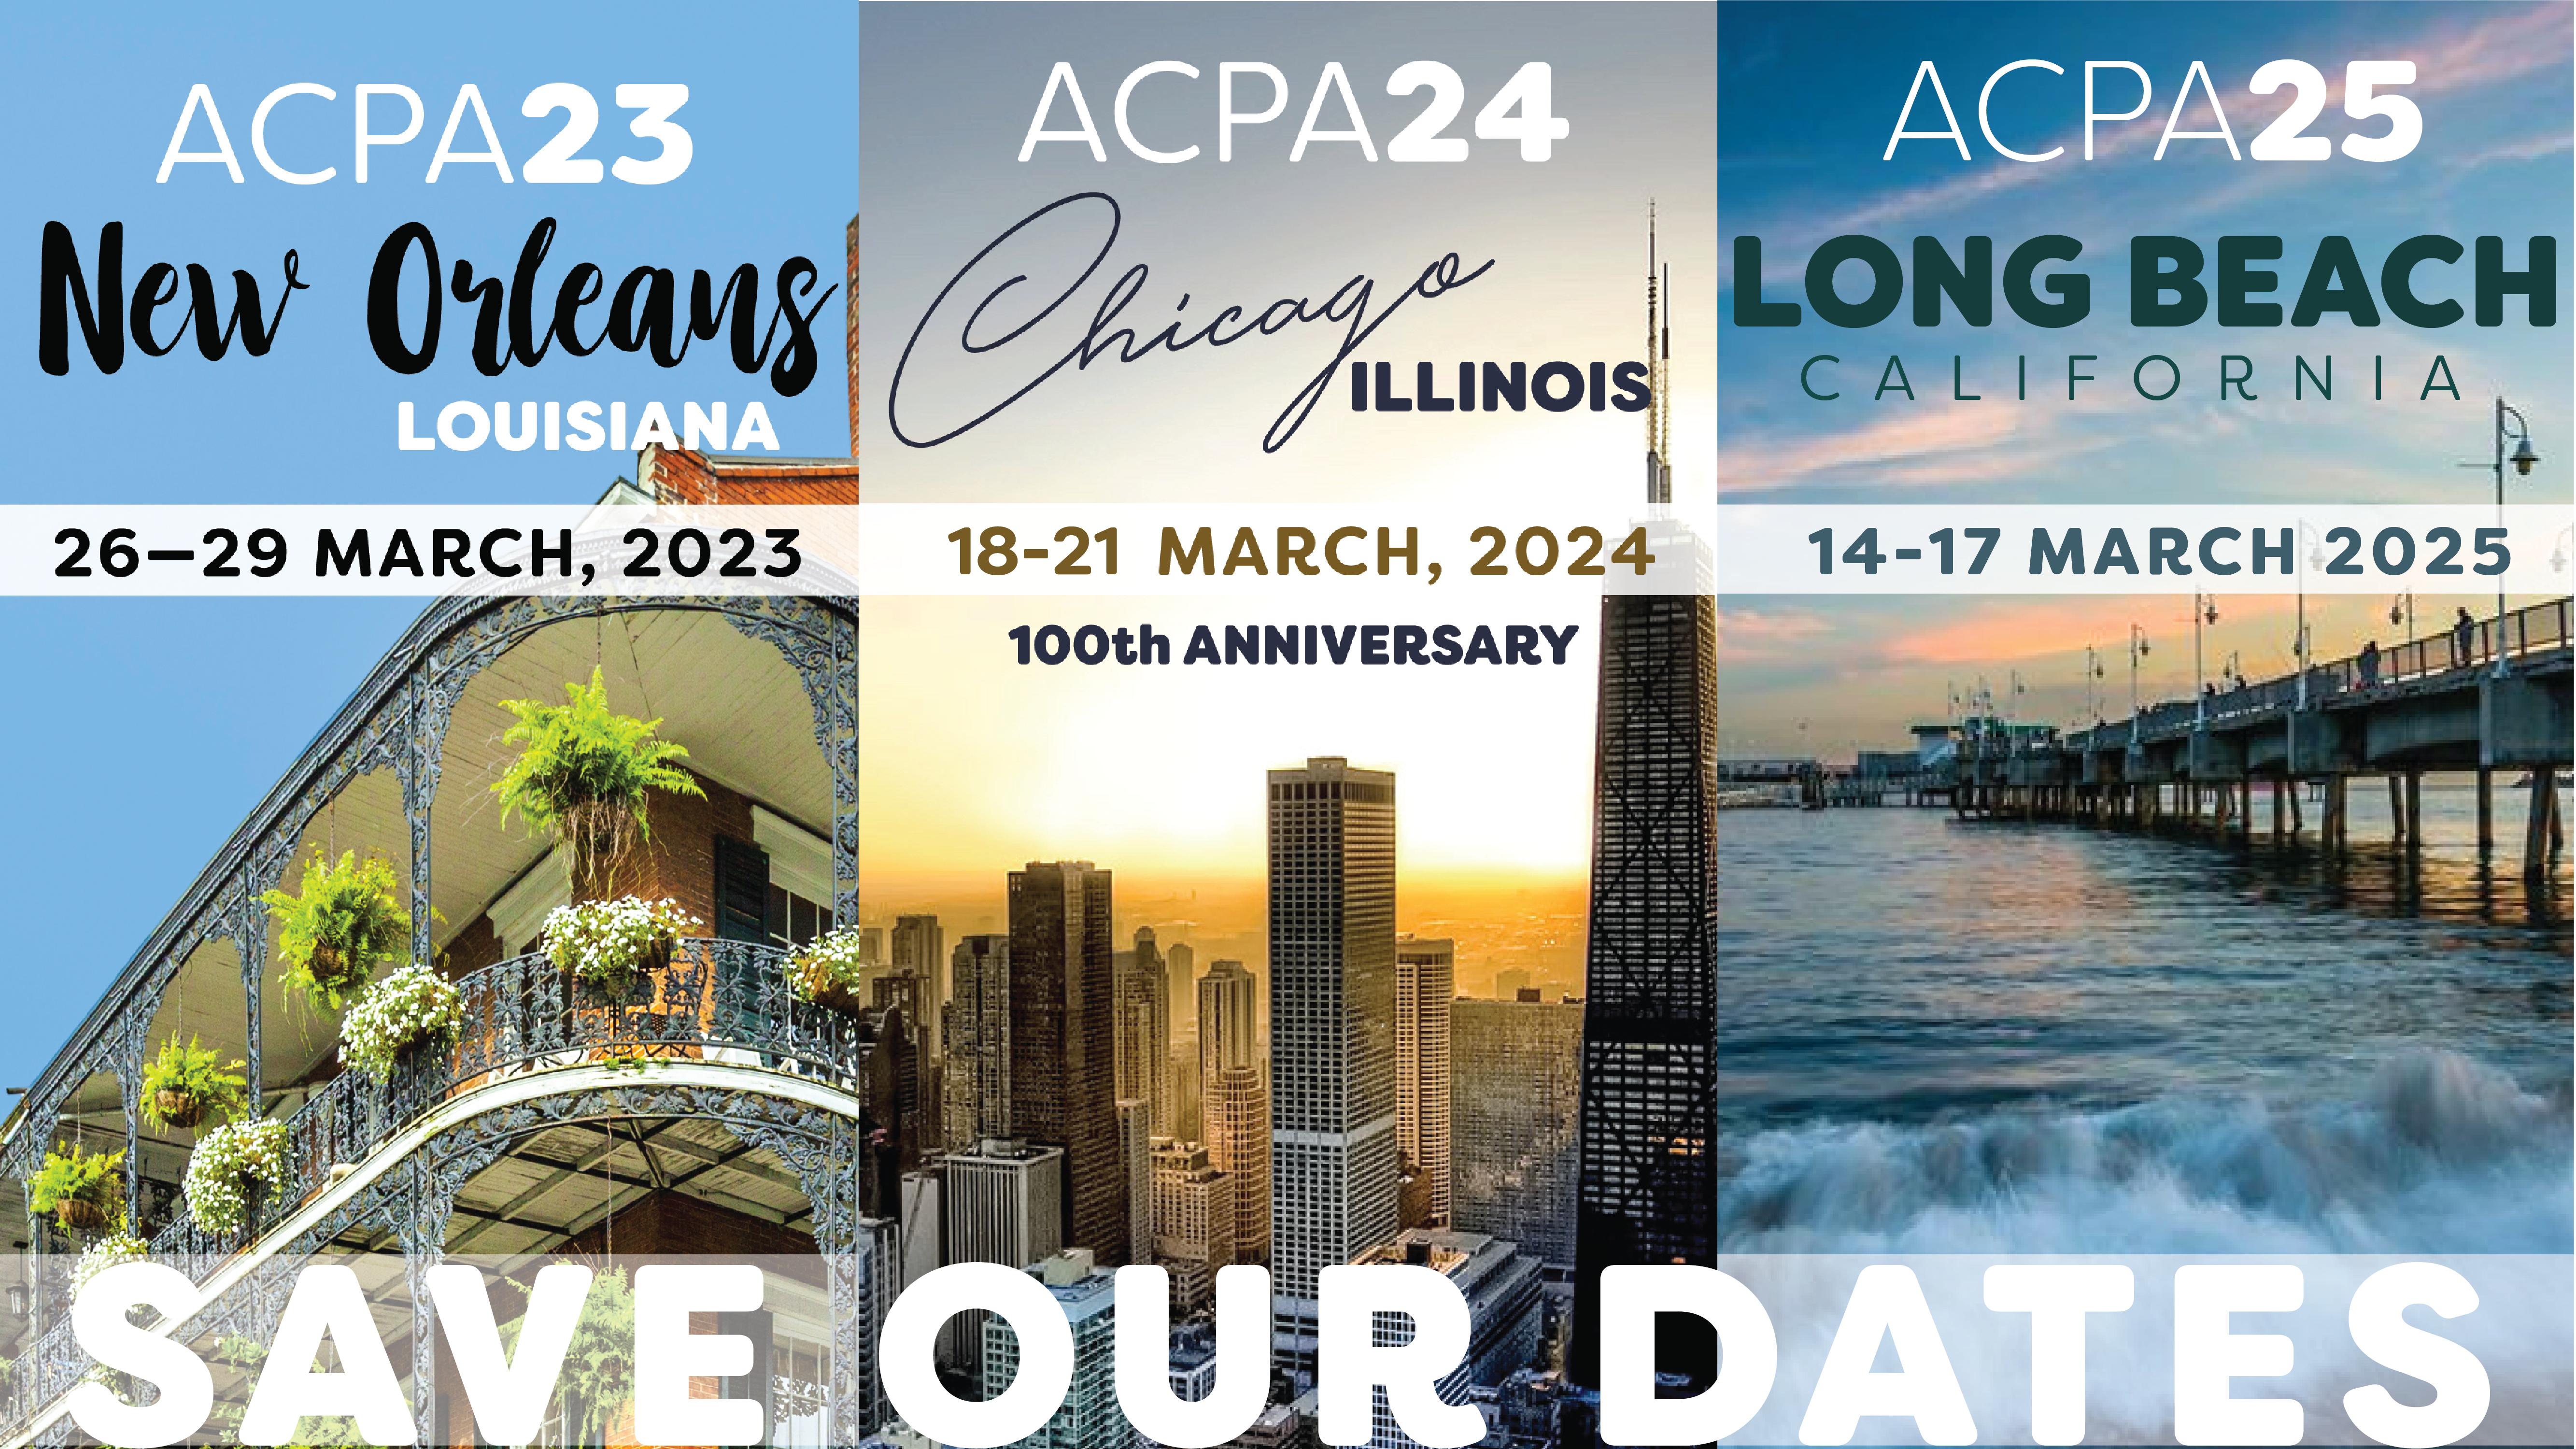 Save Our Dates. ACPA22 St Louis, ACPA23 New Orleans, ACPA24 Chicago 18-21 March 2021 100th Anniversary, ACPA25 Long Beach Balifornia 14-17 March 2025